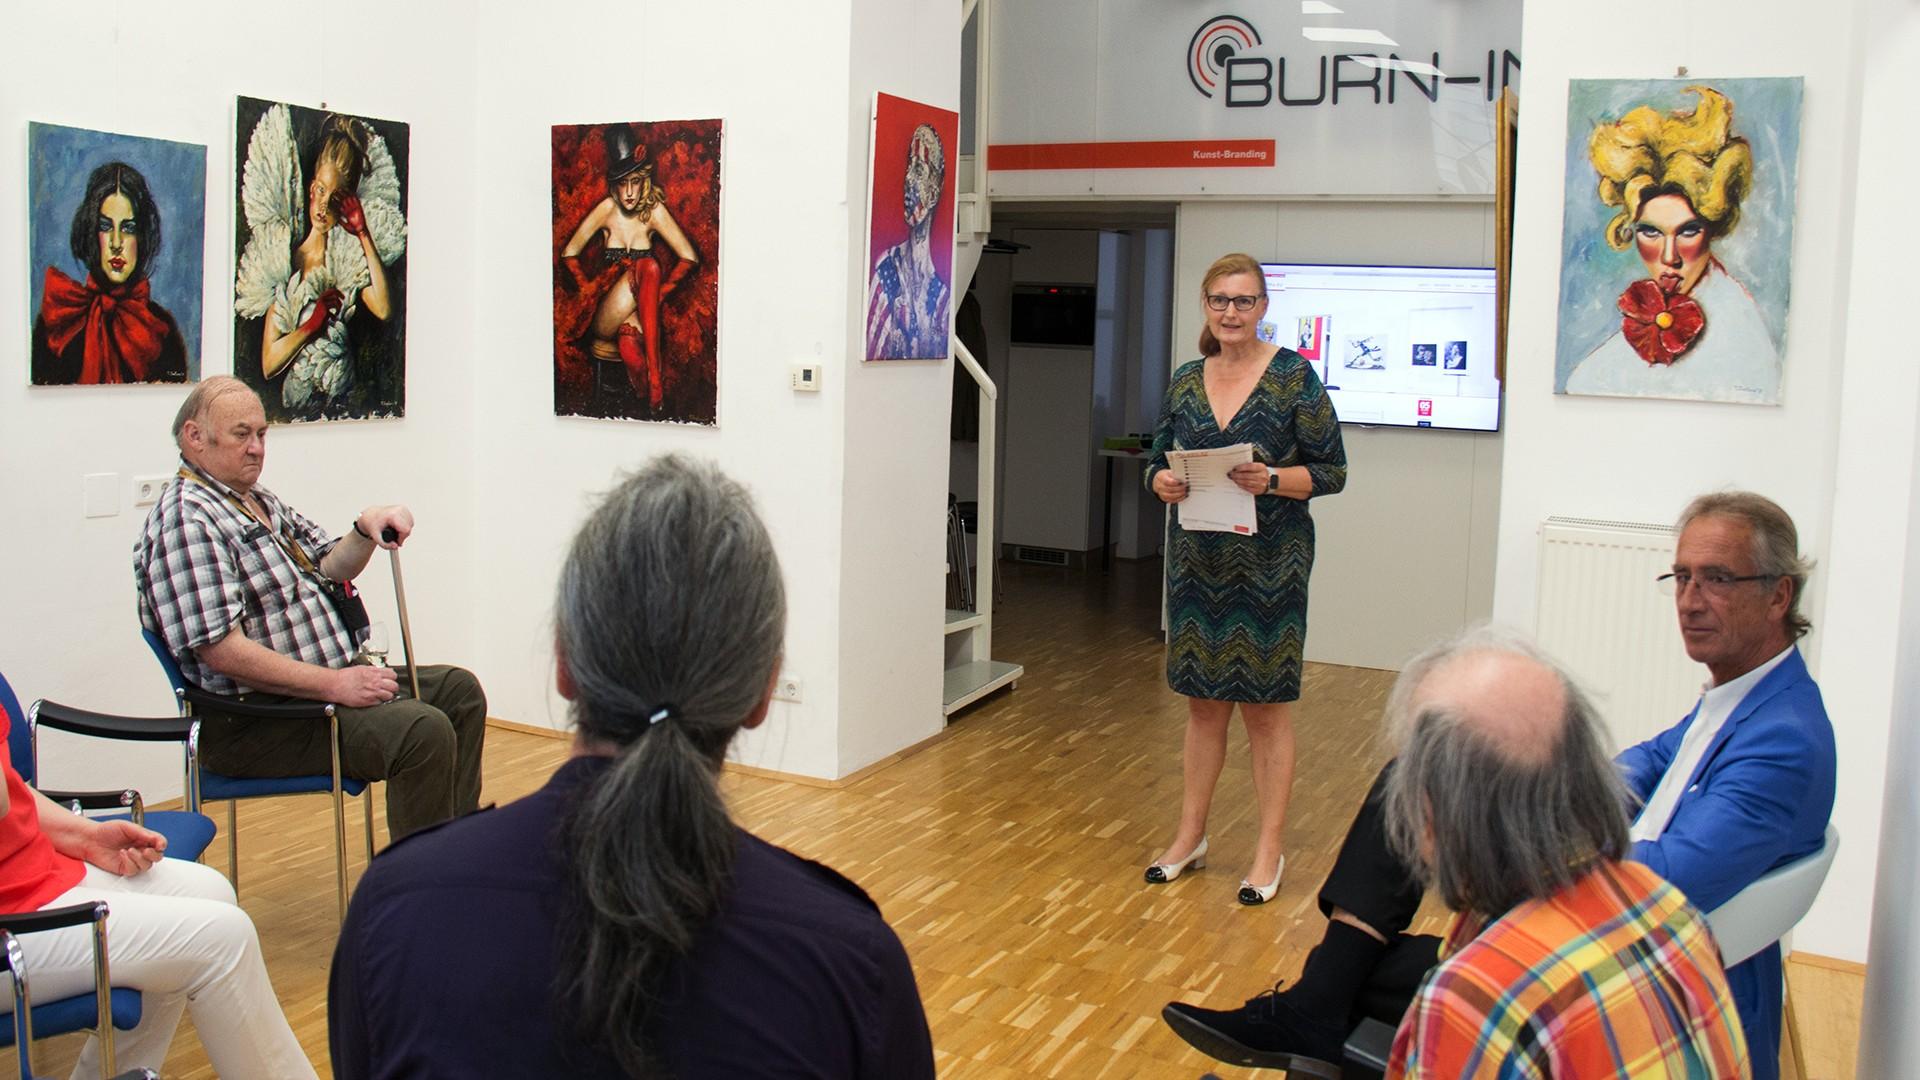 BURN-IN Vernissage Life on the run | Siedlova, Navrotskyi Juli 2018